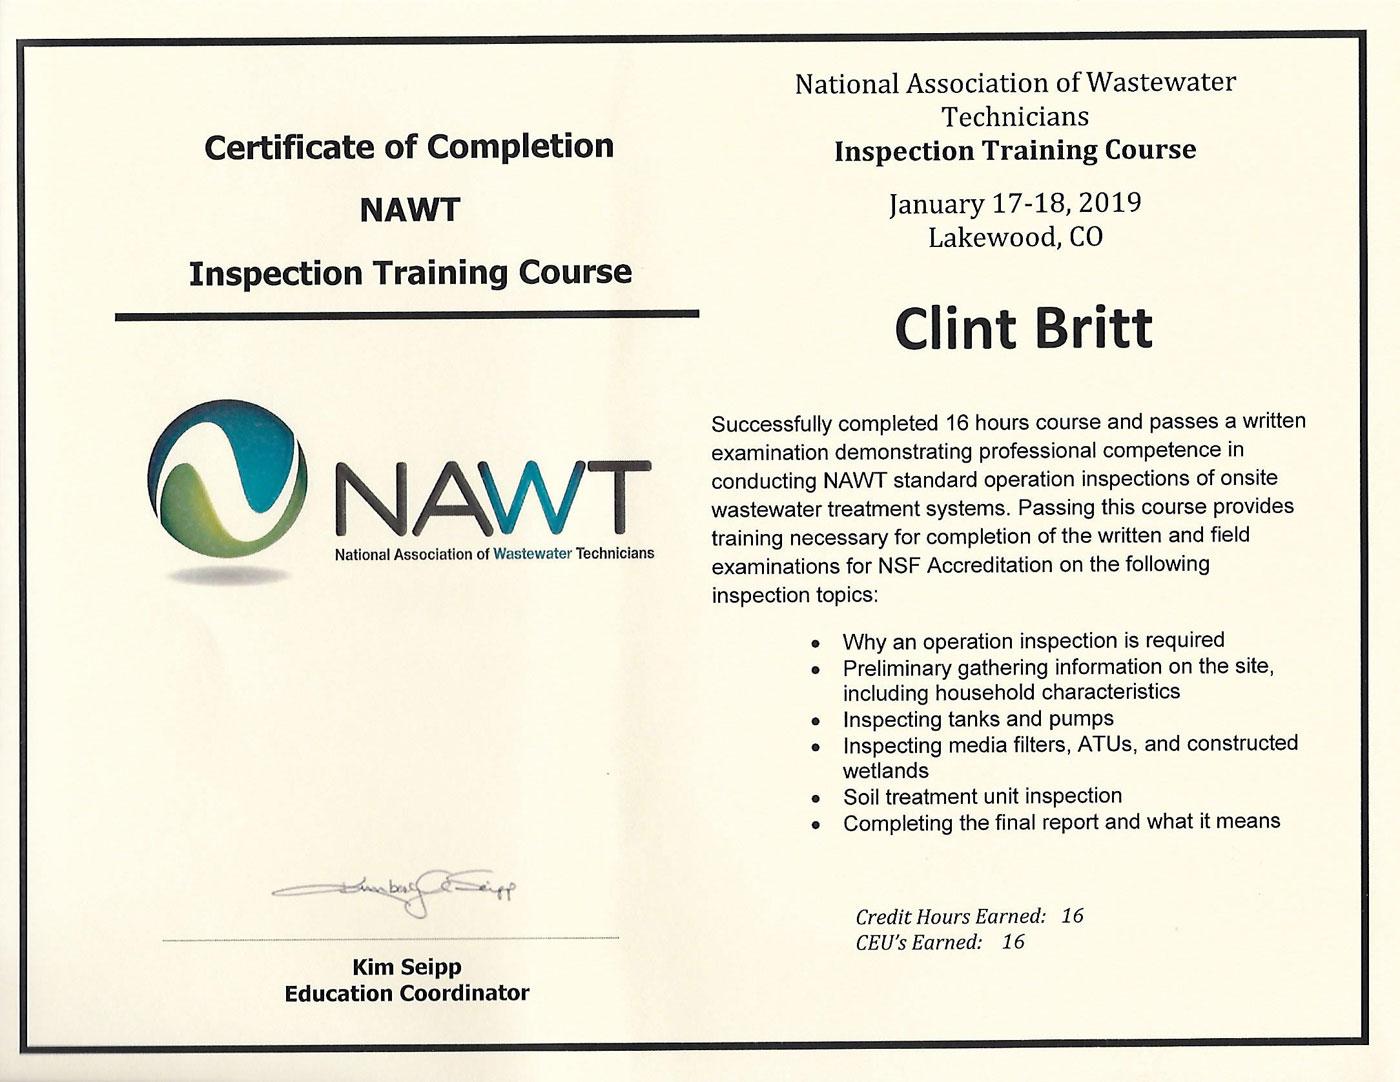 NAWT Inspector Training